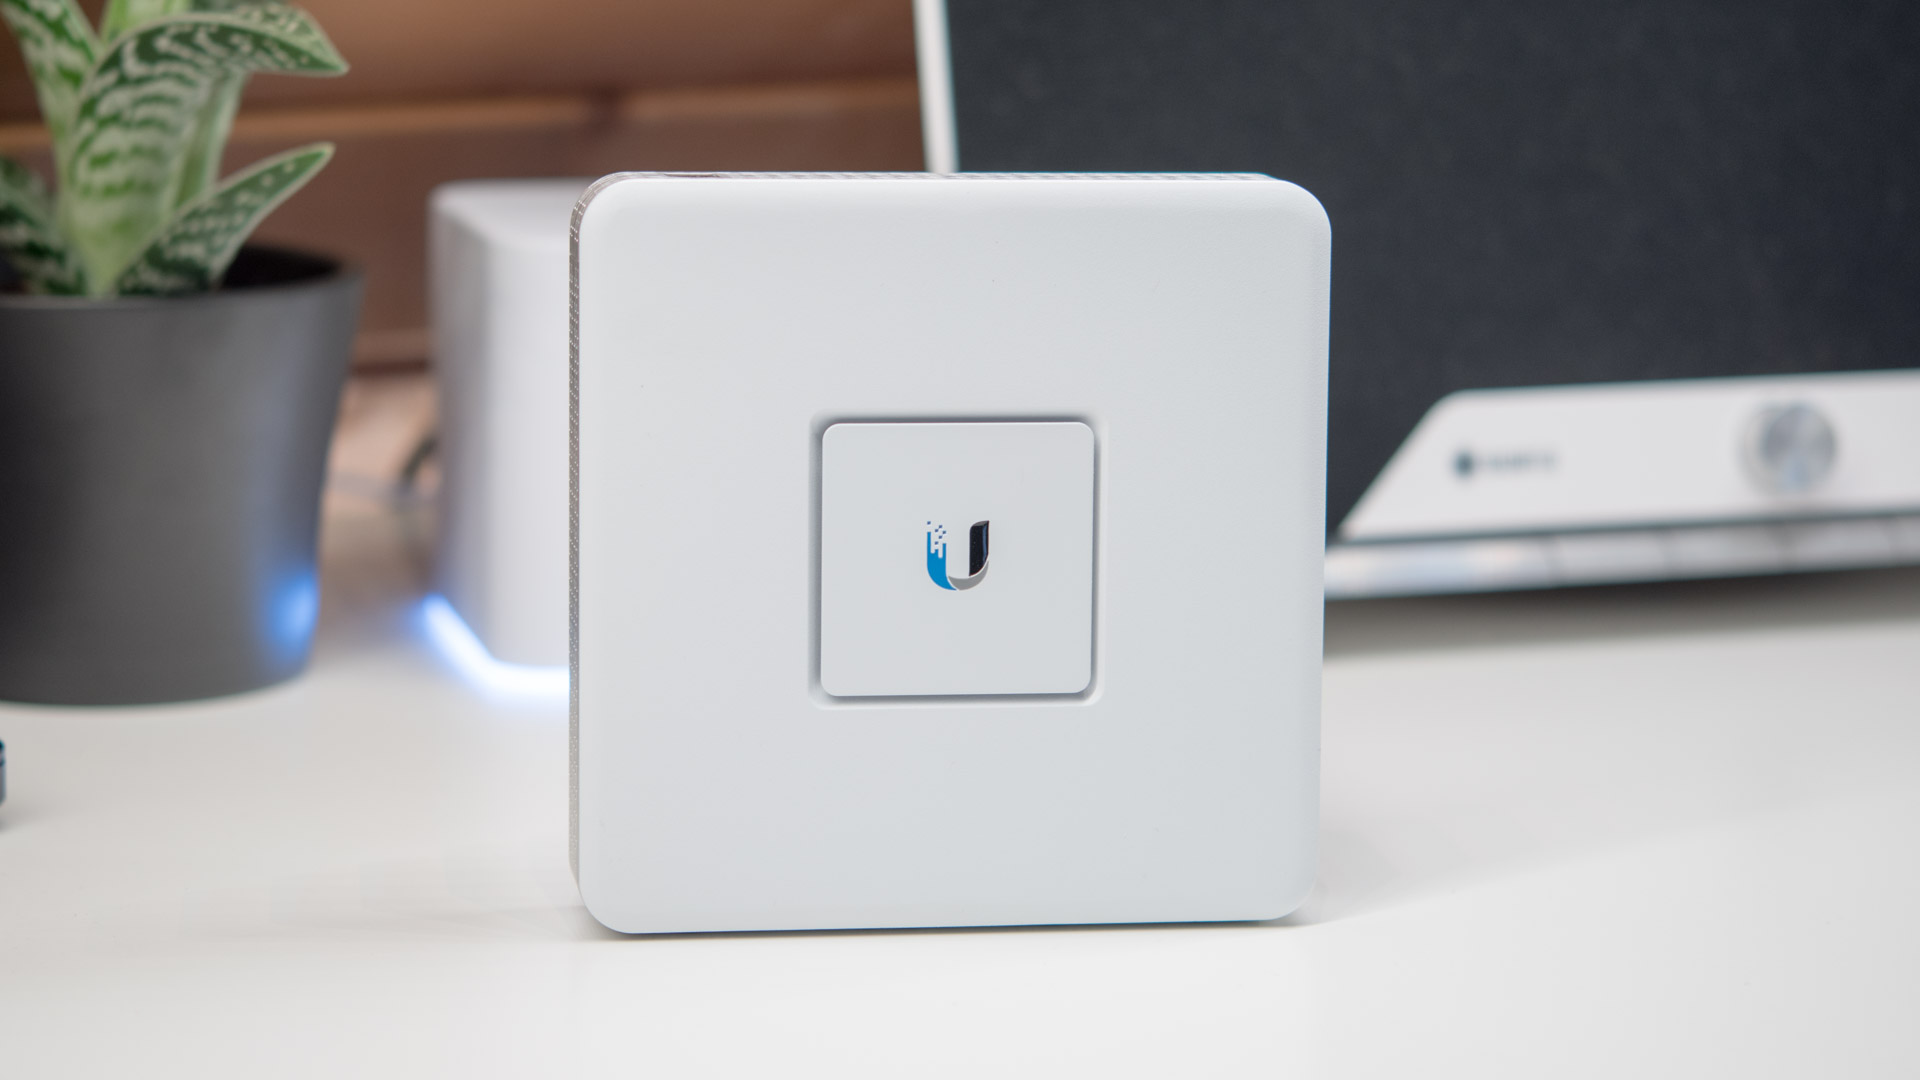 Das Ubiquiti UniFi Security Gateway im Test, die volle Kontrolle